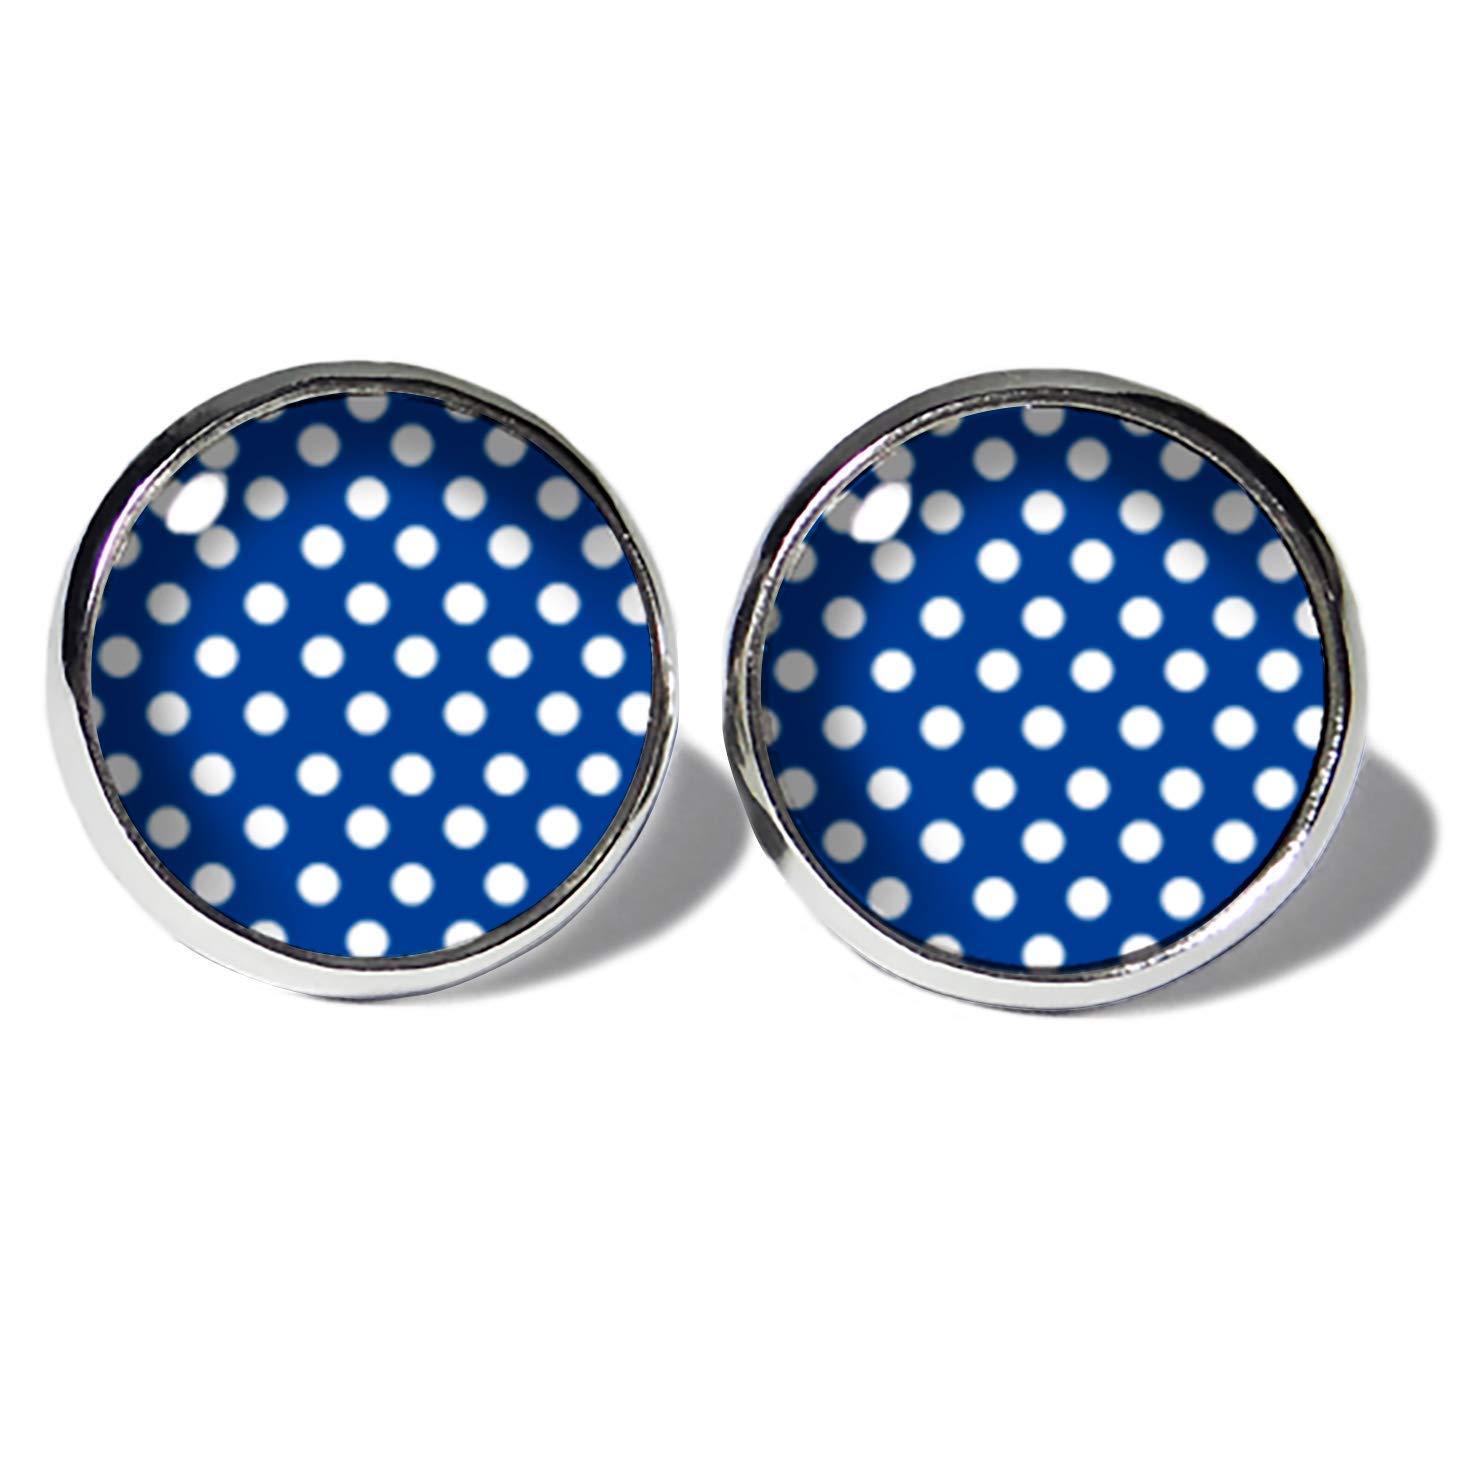 Punkte Weiss-Blau Ohrstecker ABOUKI Damen M/ädchen Kind Kinder Edelstahl Ohrschmuck Motiv Polka Dots Rockabilly gepunktet handgefertigte Ohrringe silber-farben